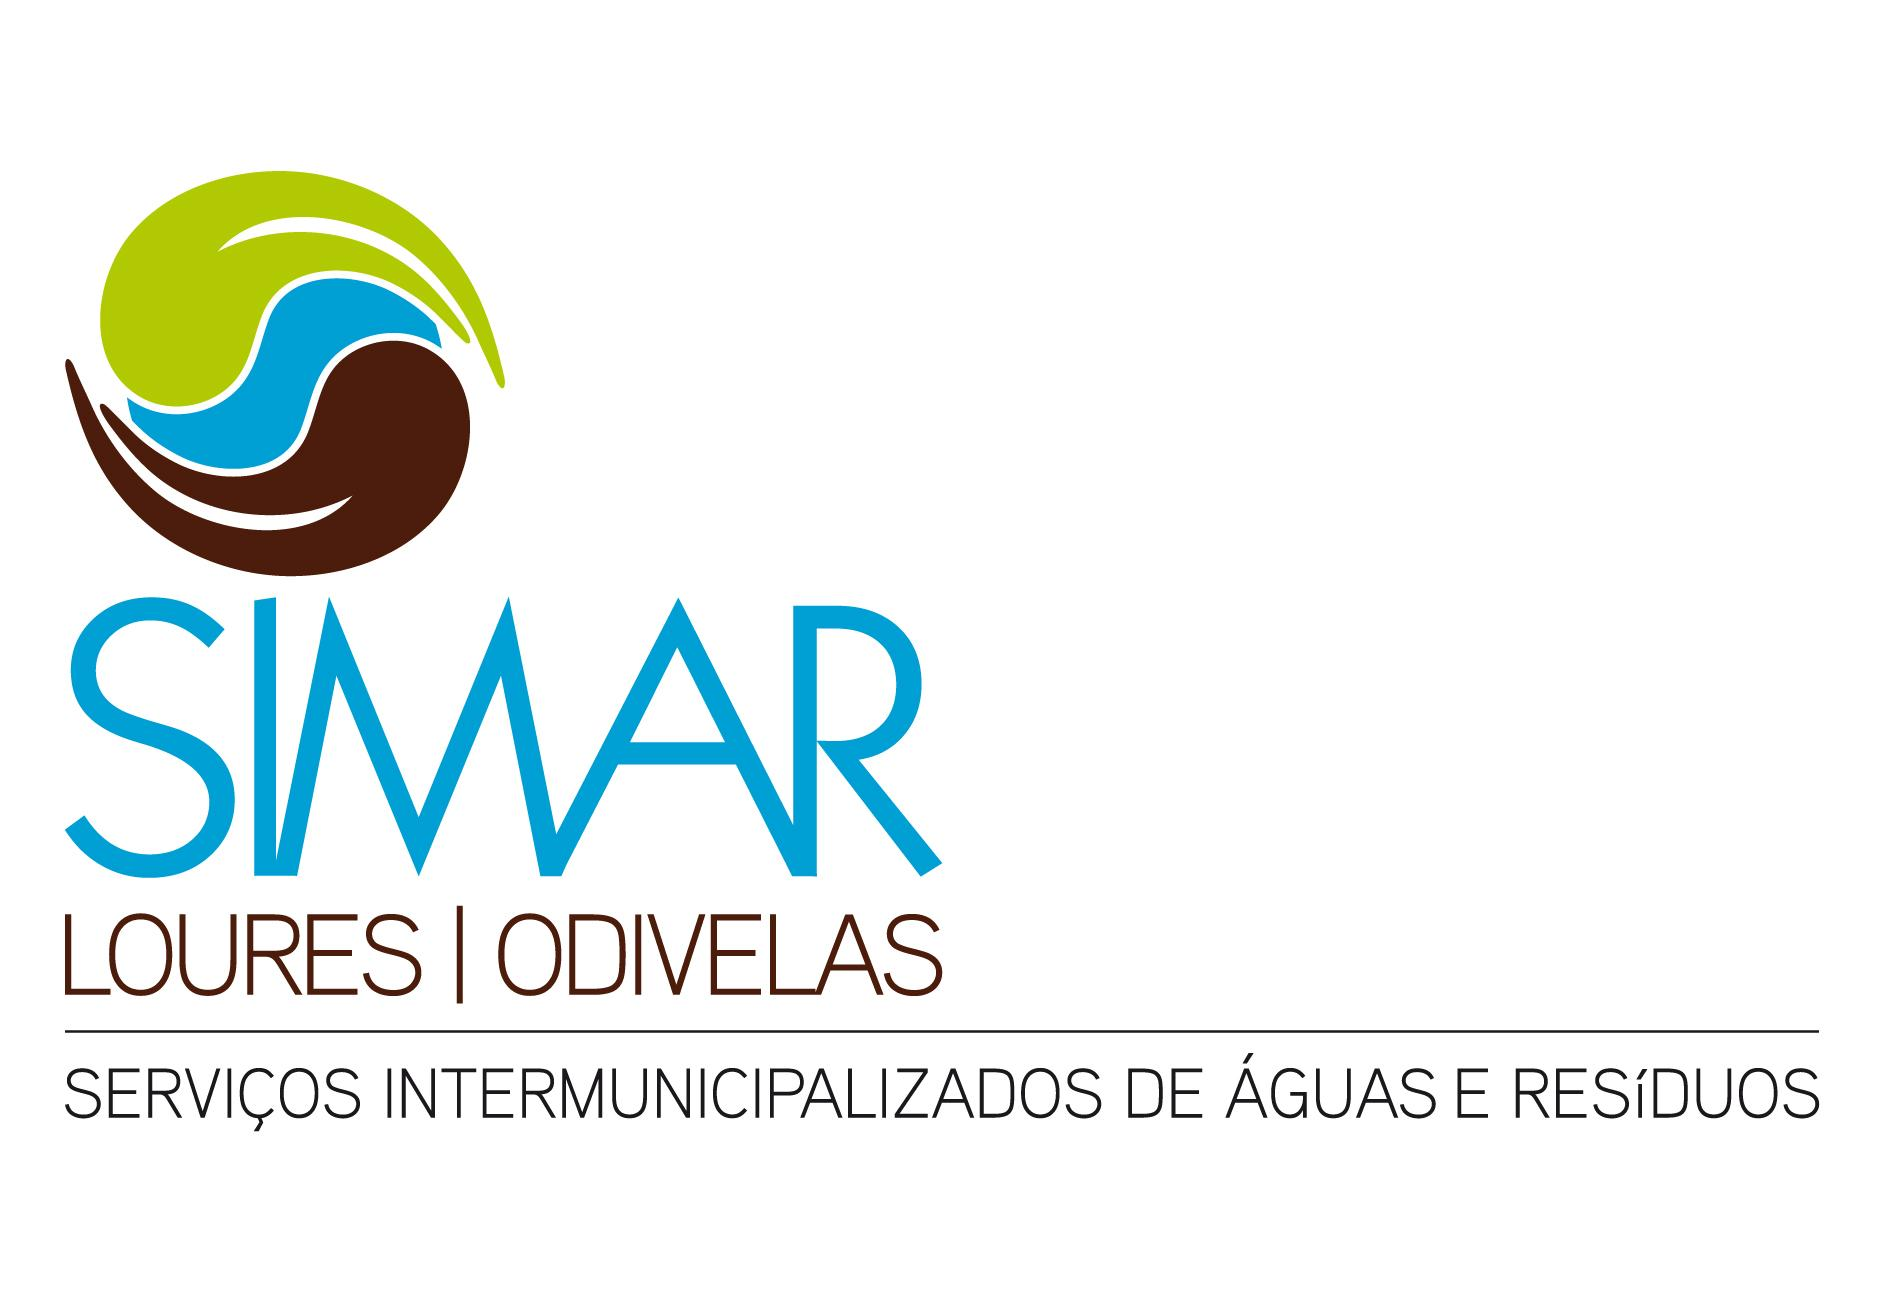 Logotipo SIMAR - Serviços Intermunicipalizados de Águas e Resíduos de Loures e Odivelas